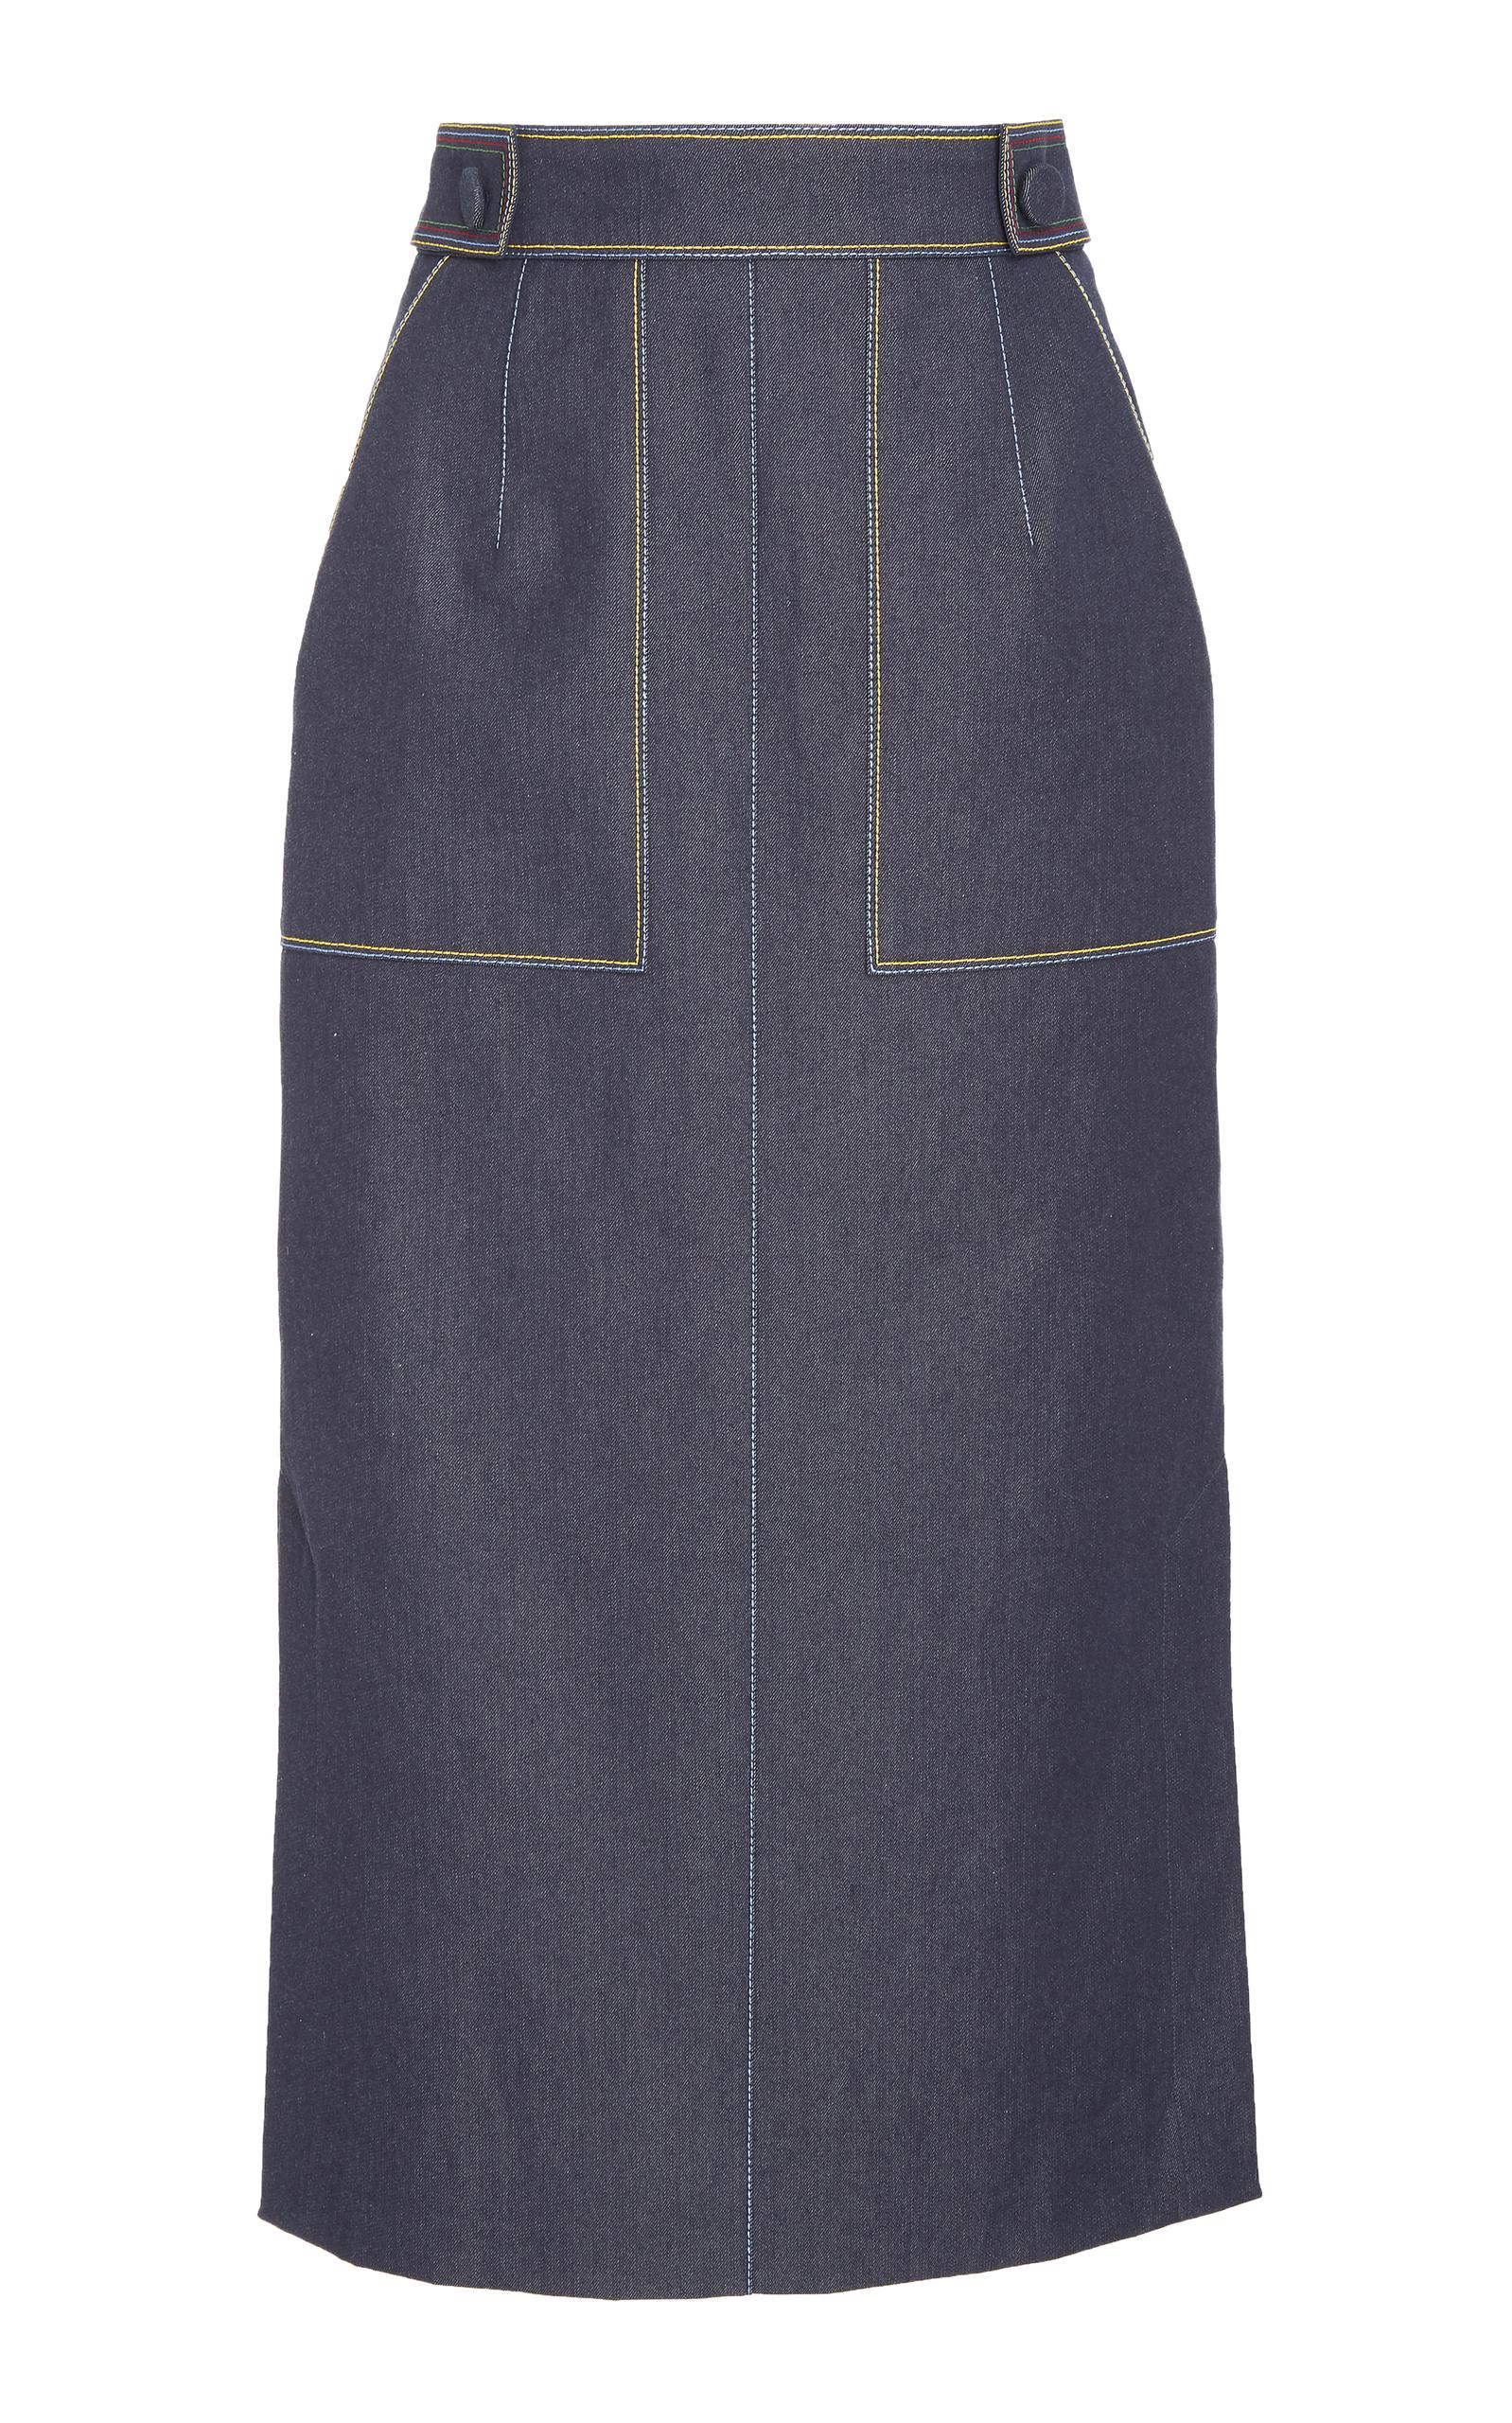 4c209000bc Pencil Skirt With Pockets by Carolina Herrera | Moda Operandi